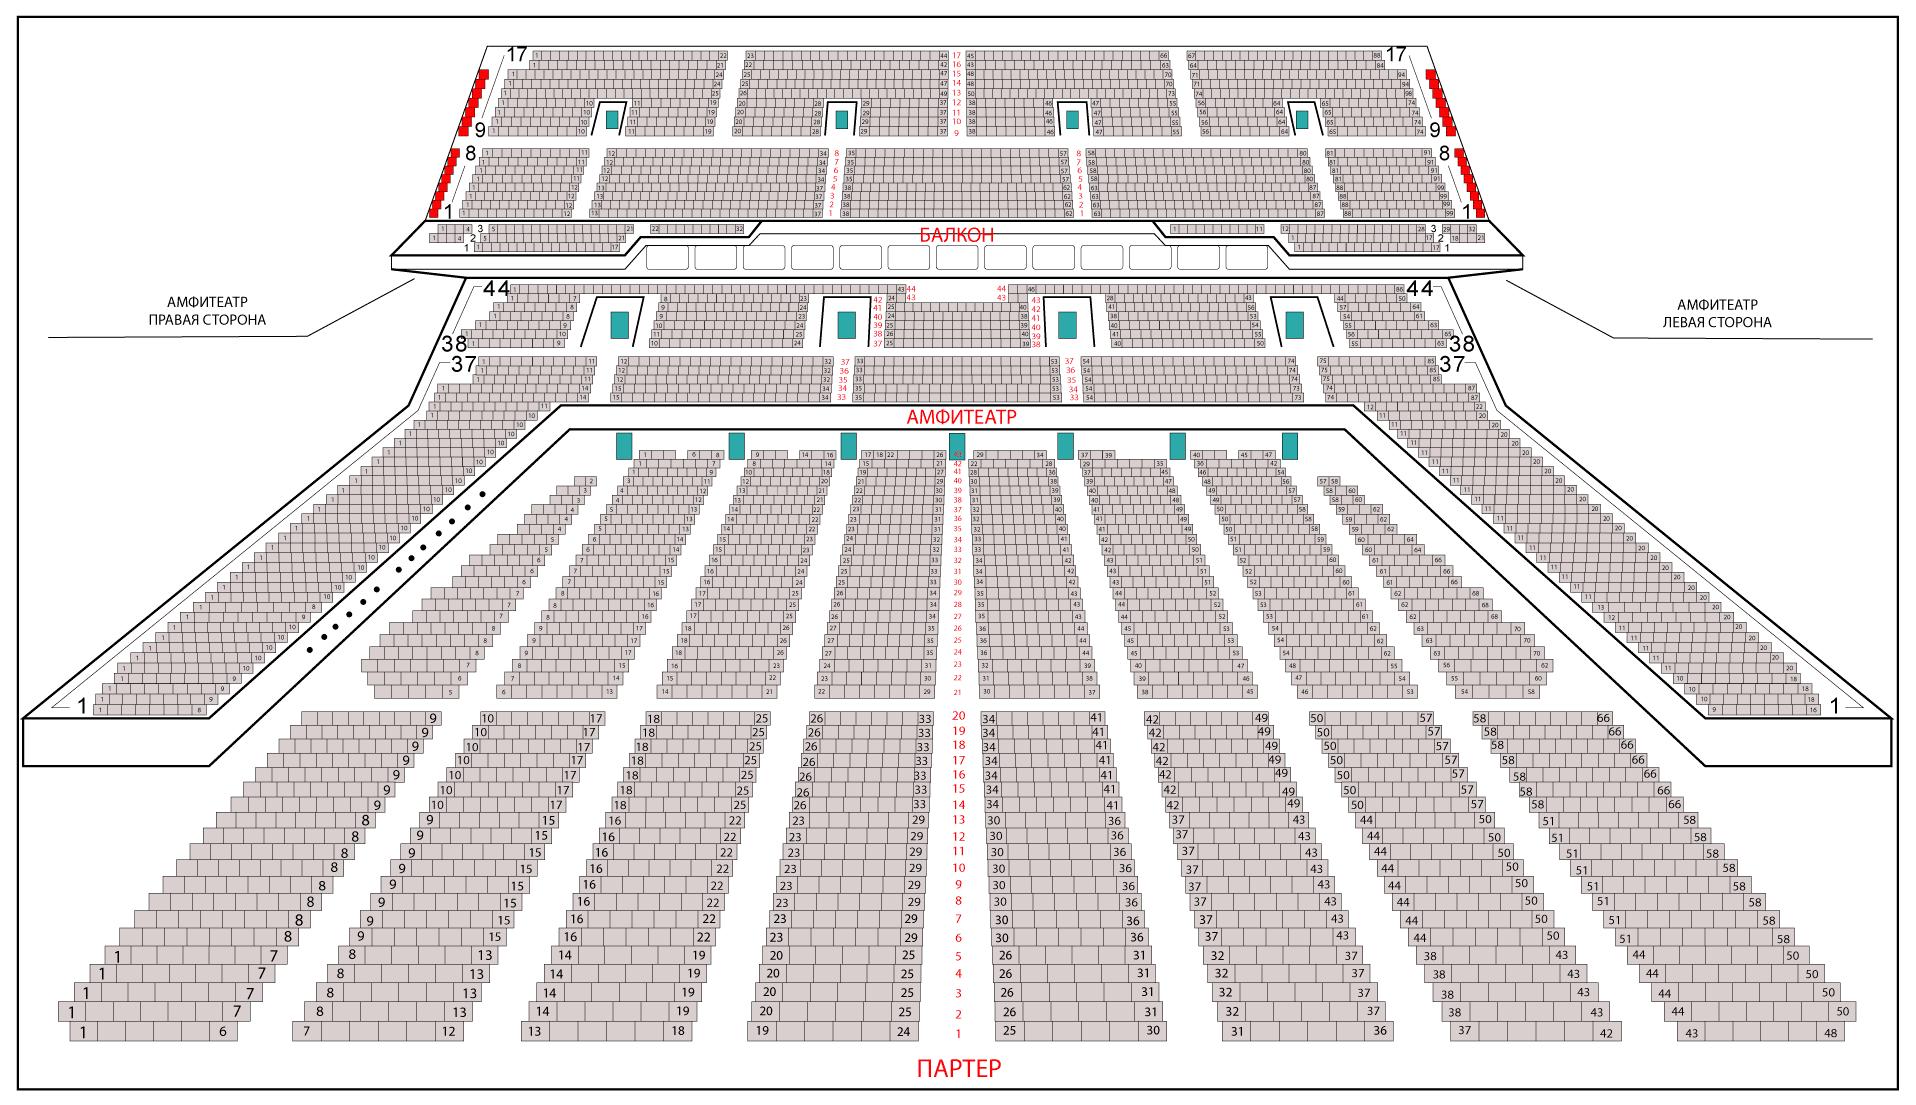 Схема проезда кремлёвский дворец съездов фото 47